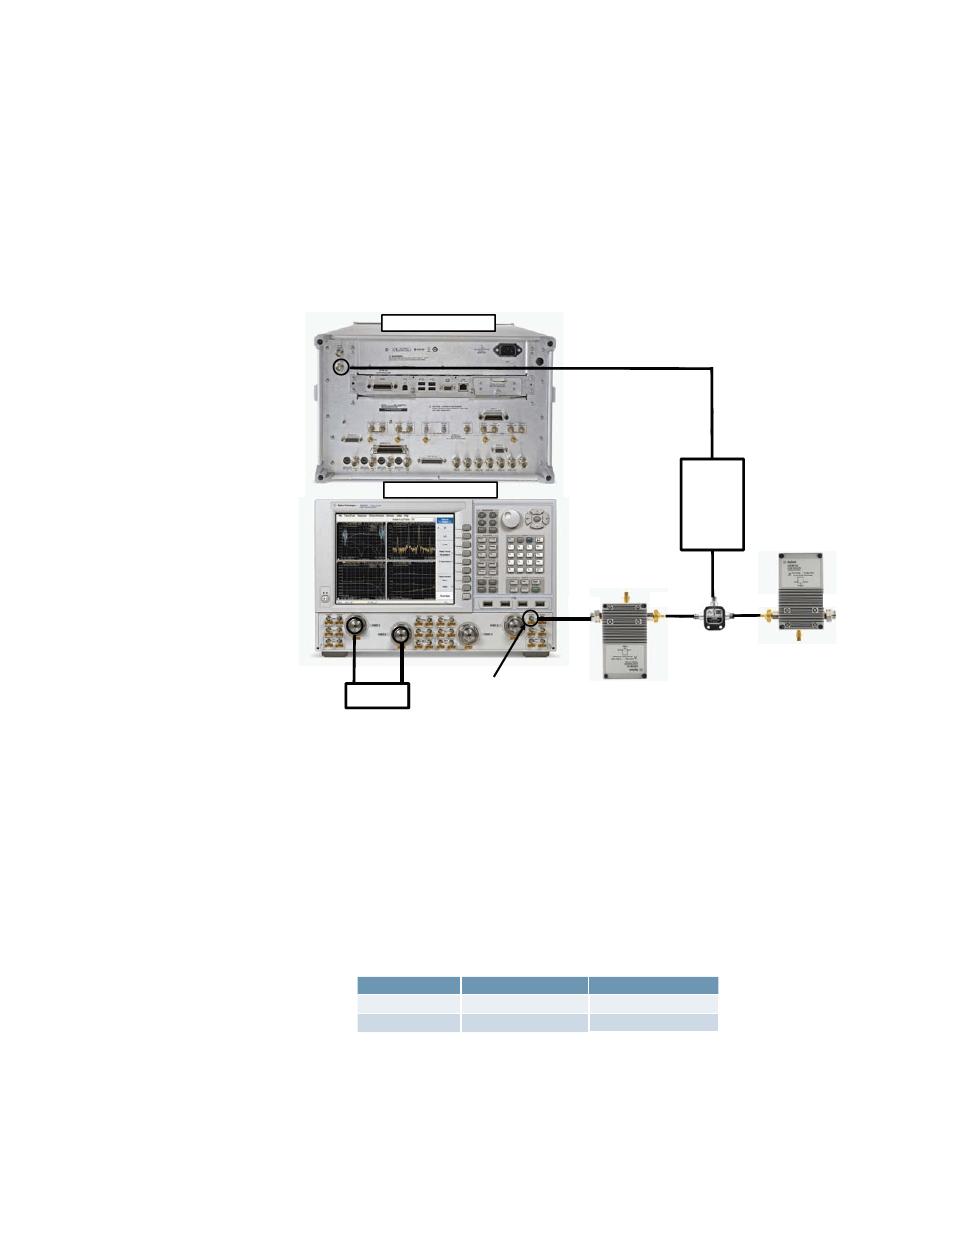 Dc power supply compatibility, Alternative configuration